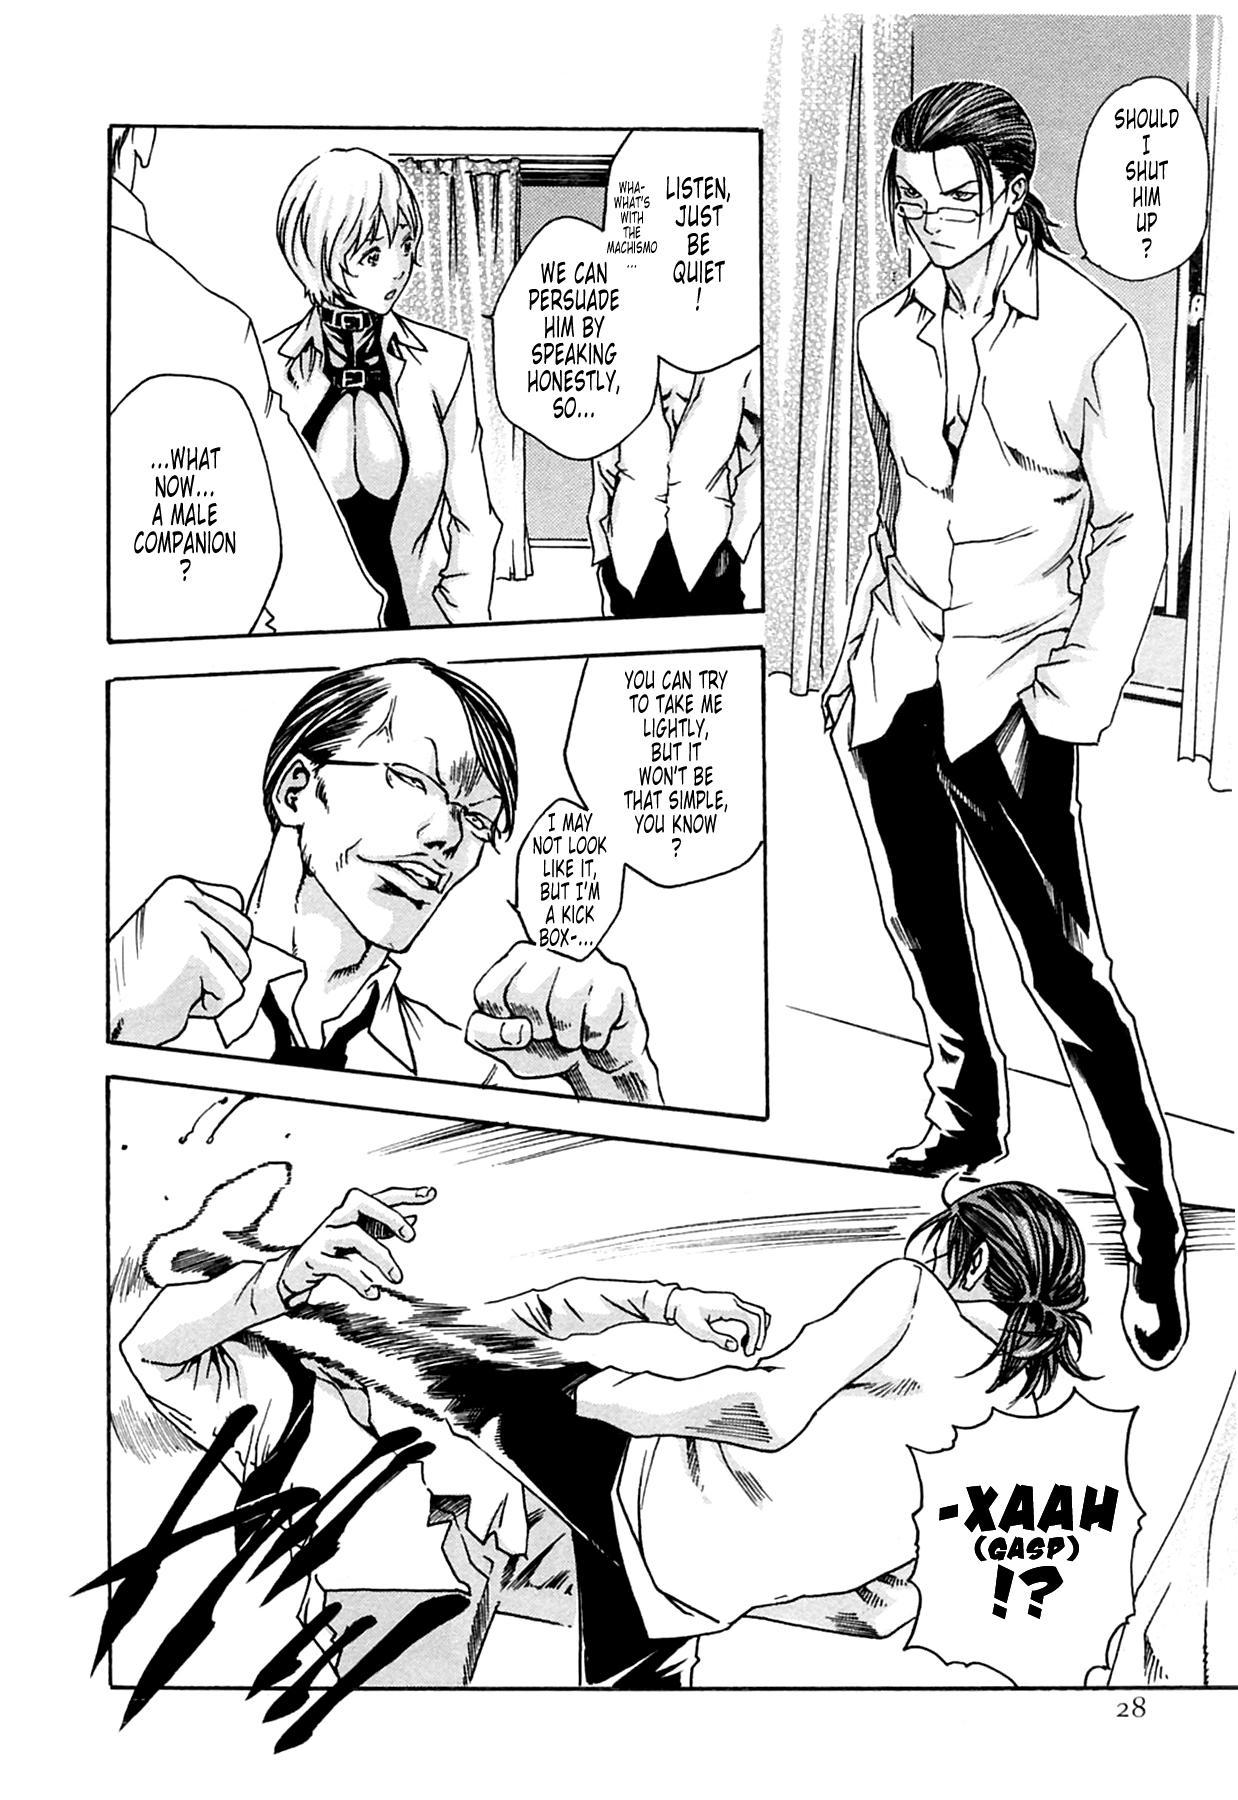 [Haruki] Kisei Juui Suzune (Parasite Doctor Suzune) Vol.02 - CH10-11 27